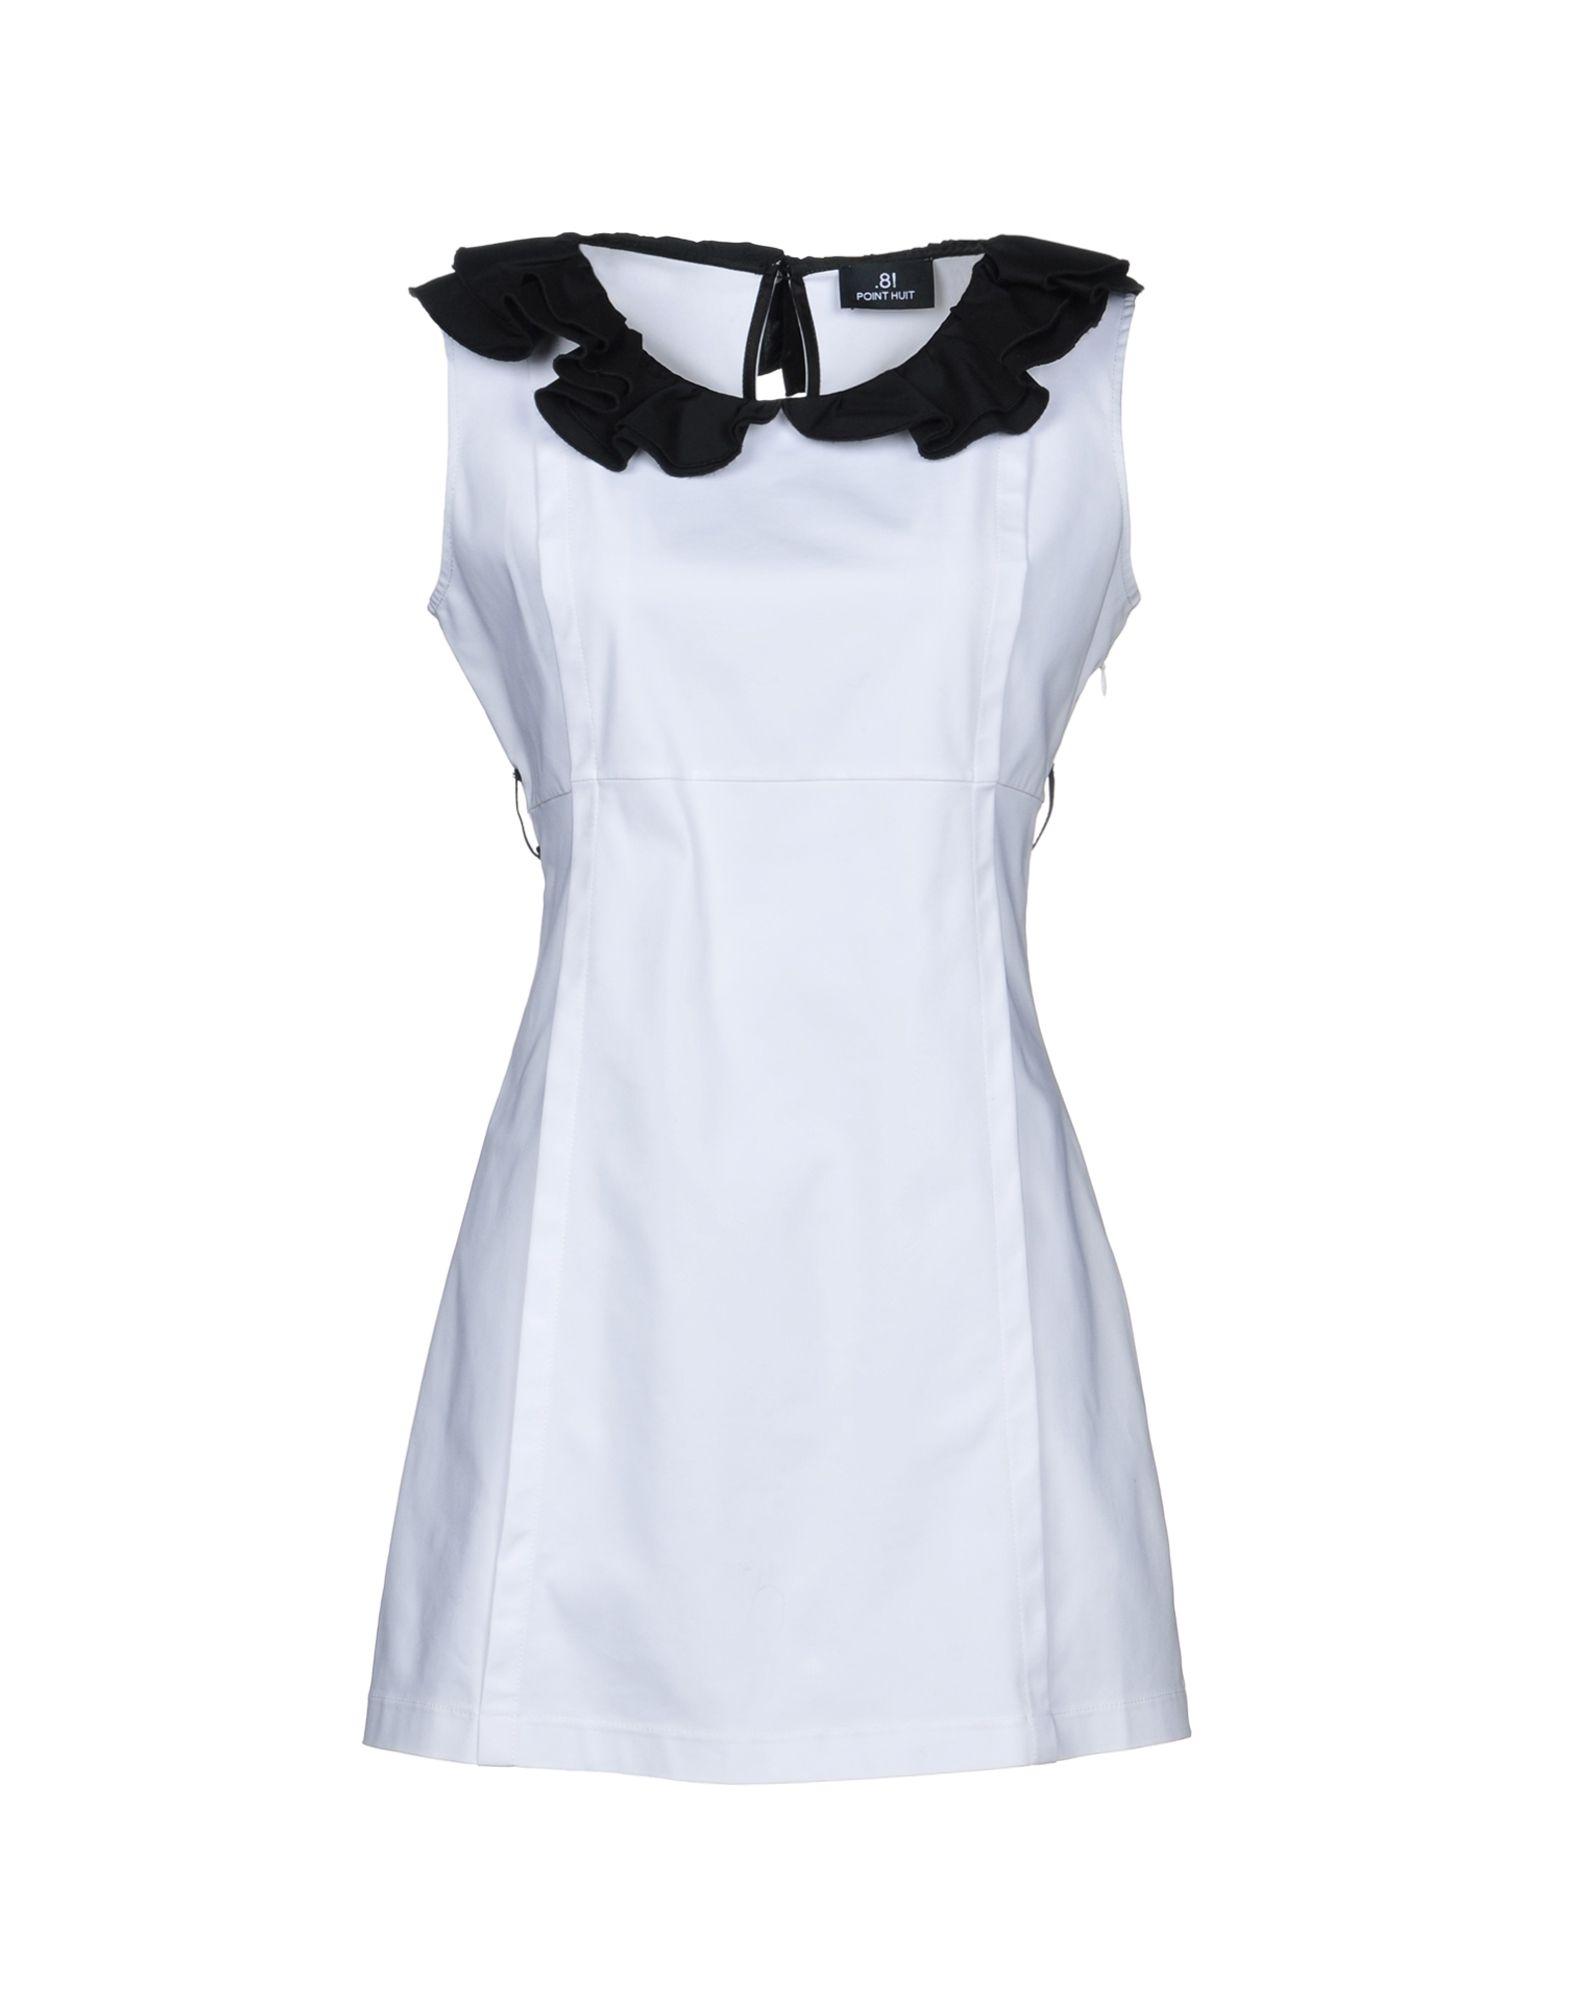 .8! POINT HUIT Короткое платье 8 point huit юбка до колена